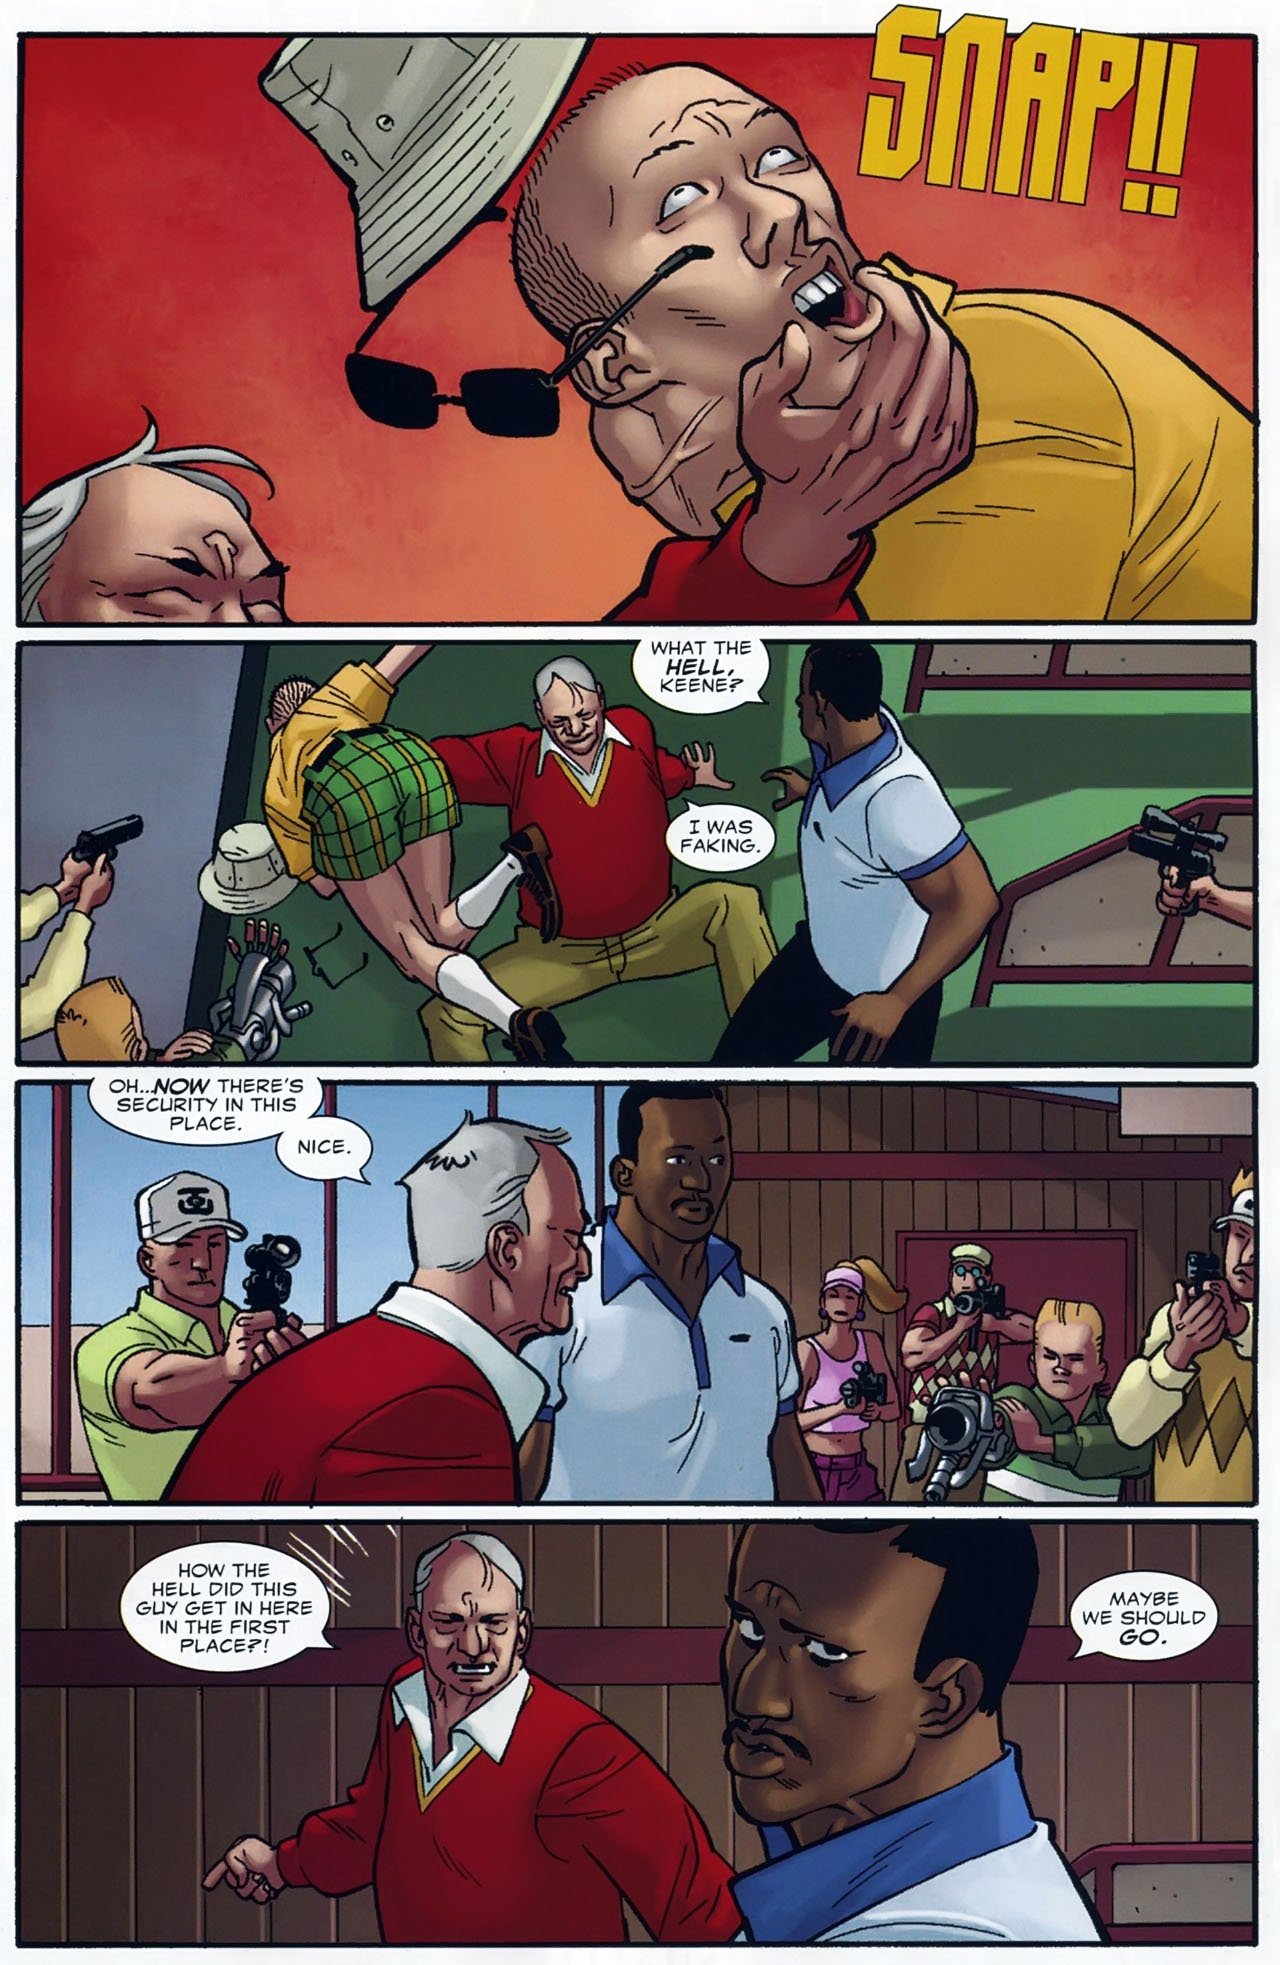 Read online Destroyer comic -  Issue #2 - 10